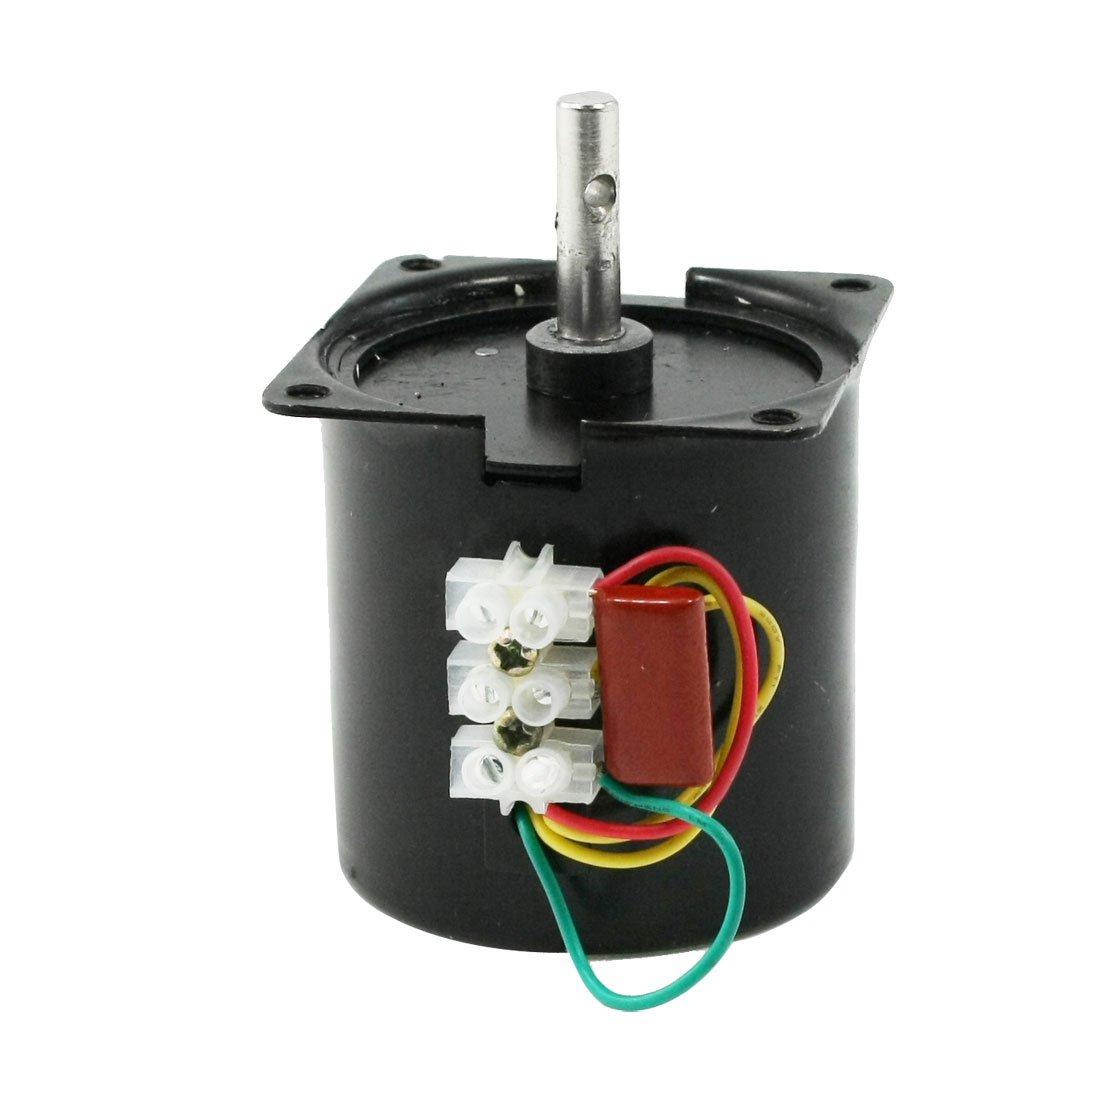 sourcingmap AC 220V 2.5RPM 7mm Shaft Diameter Machine Synchronous Gear Motor a13052700ux0272